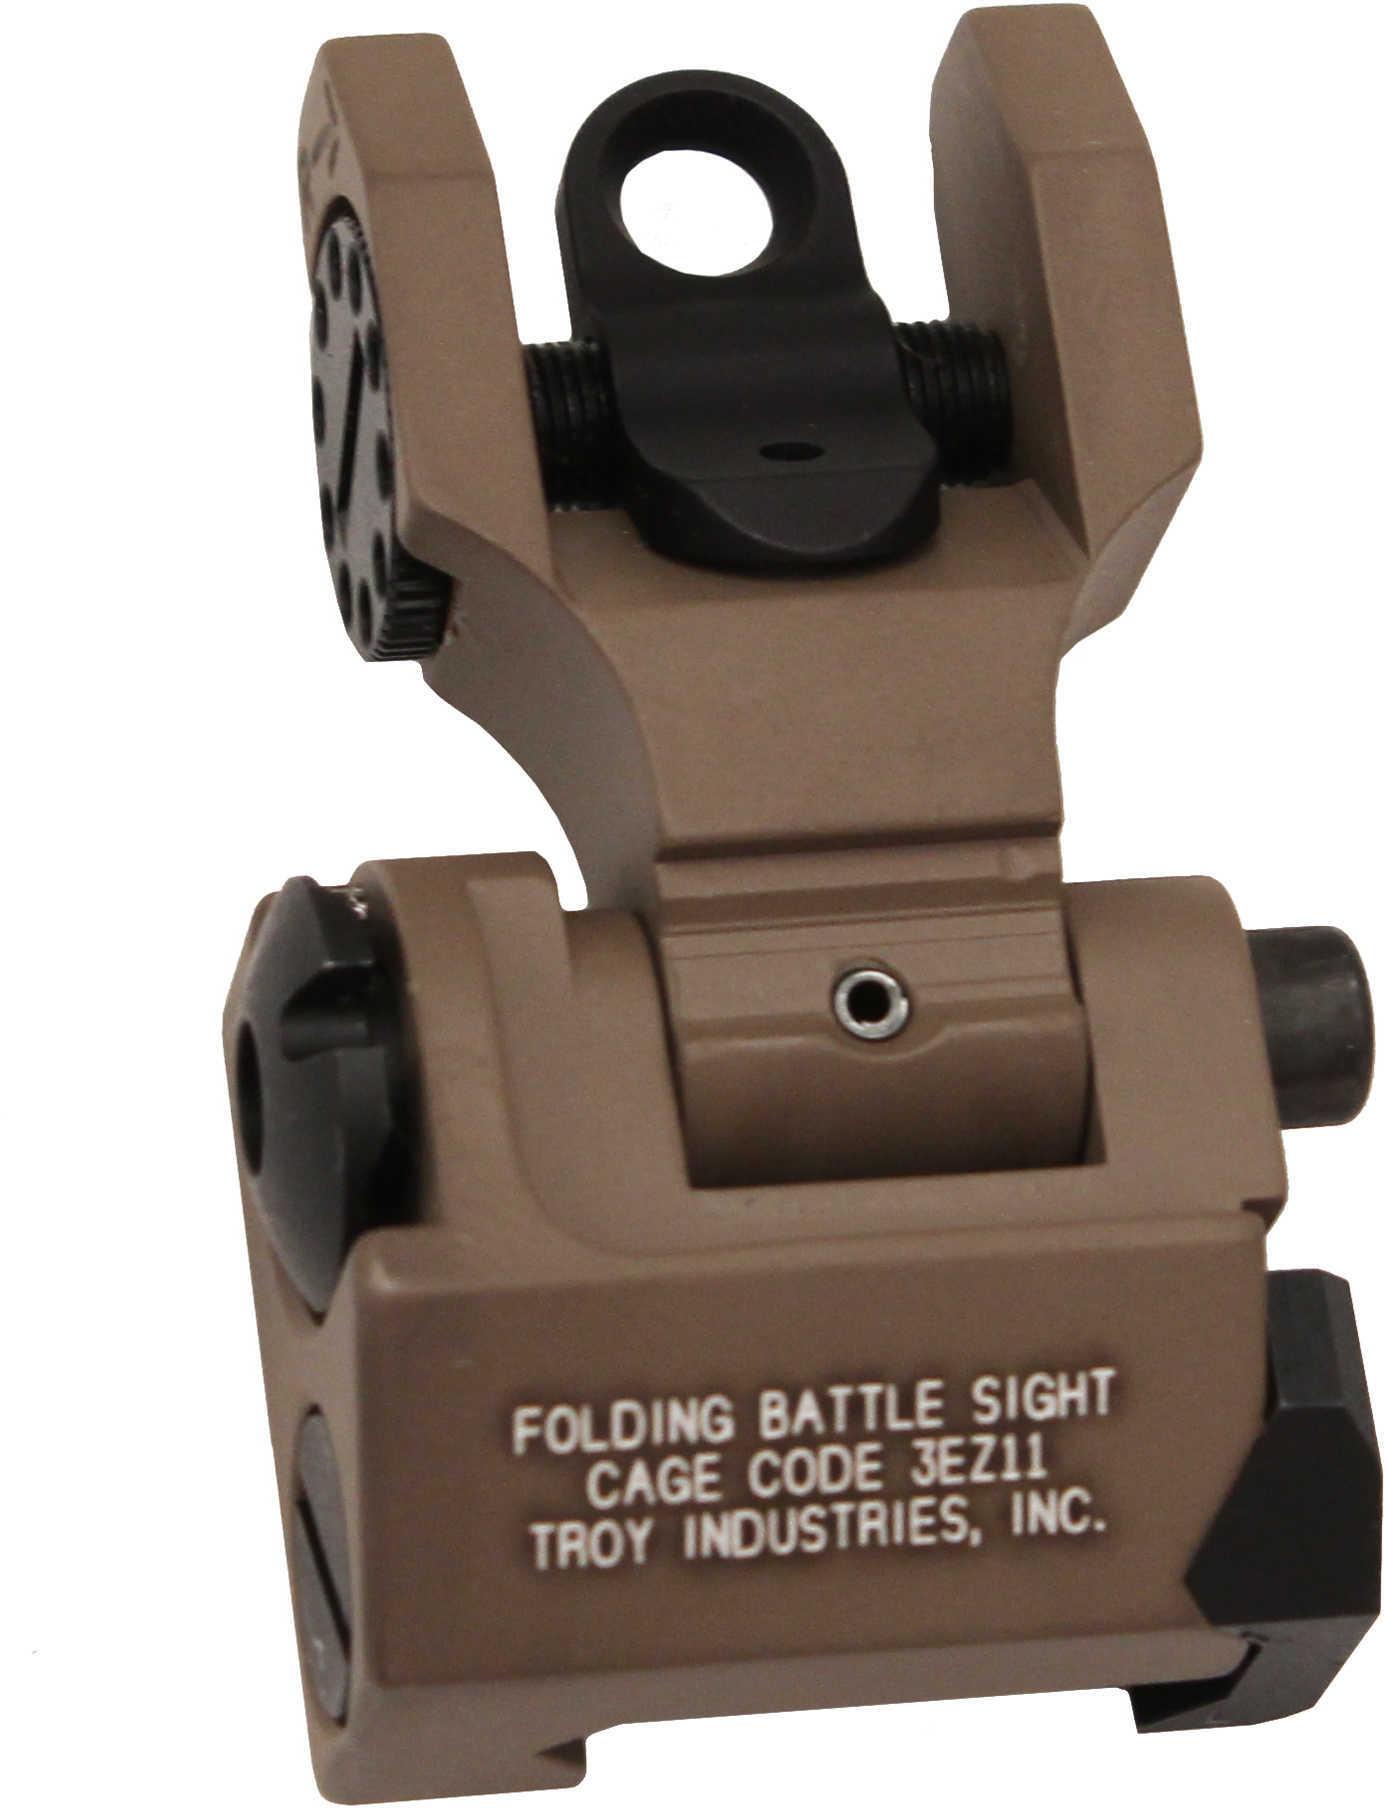 Troy Ind SSIGFBSROFT Battle Sight Rear Folding AR-15/M4/M16 FDE